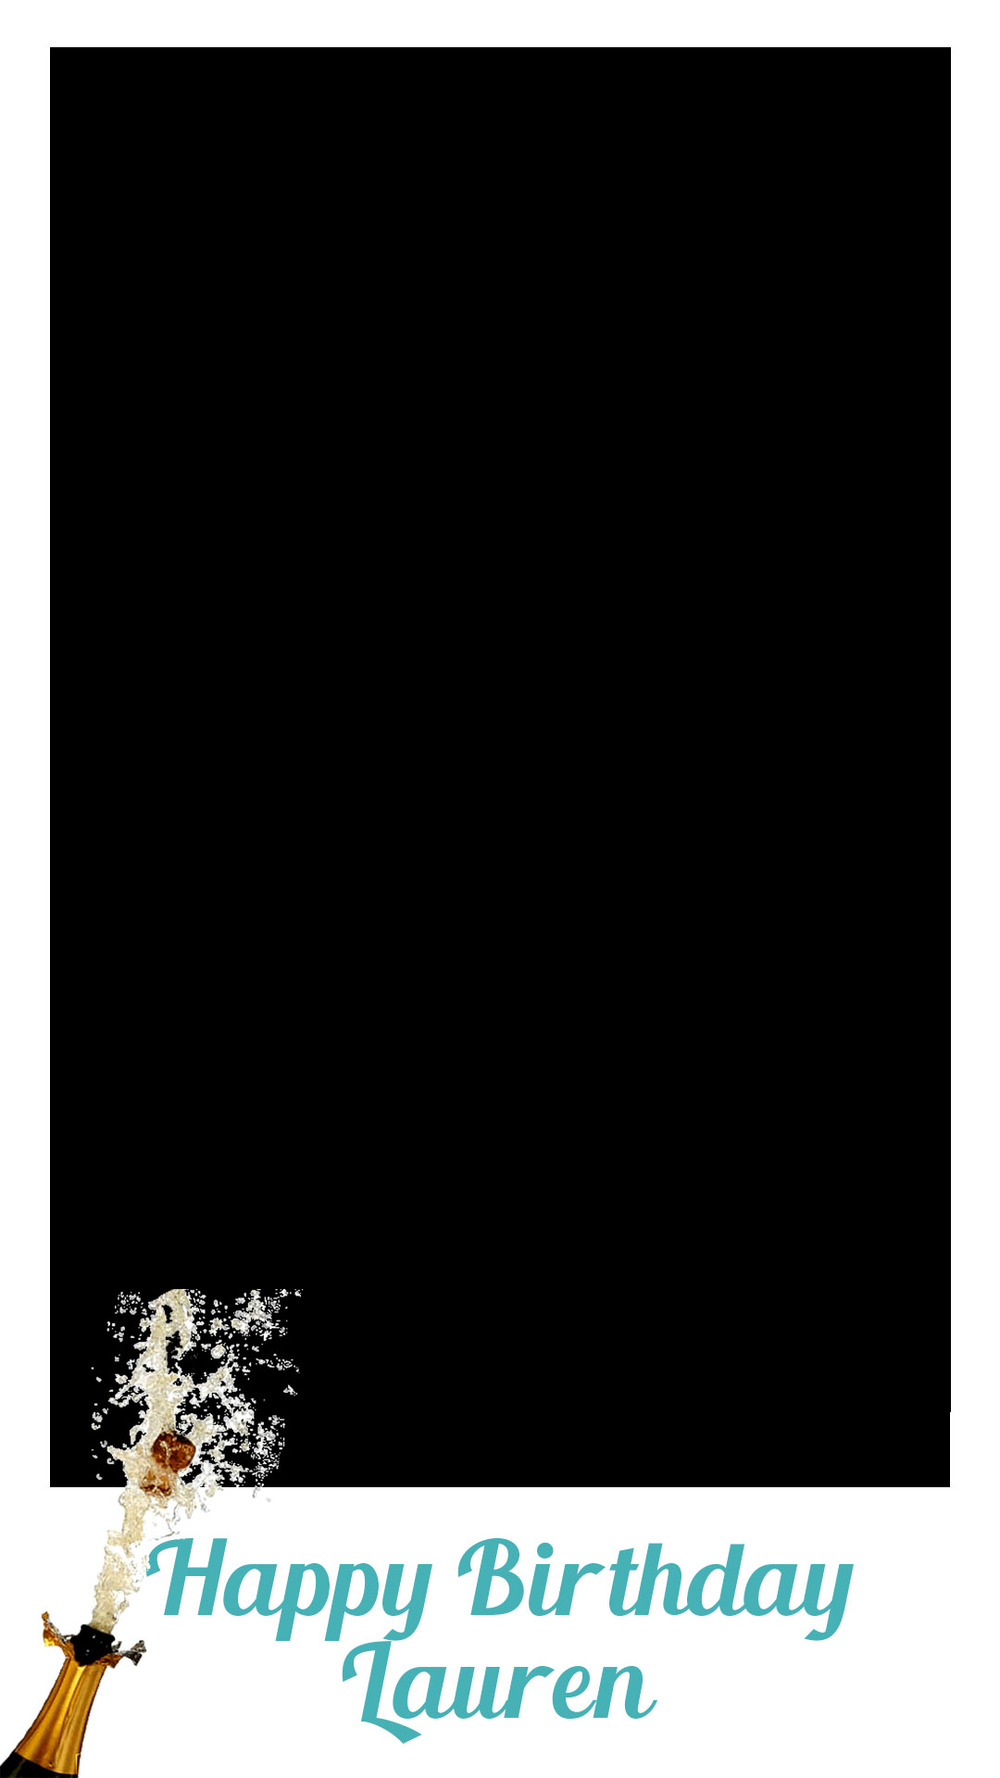 Happy birthday lauren polaroid.jpg